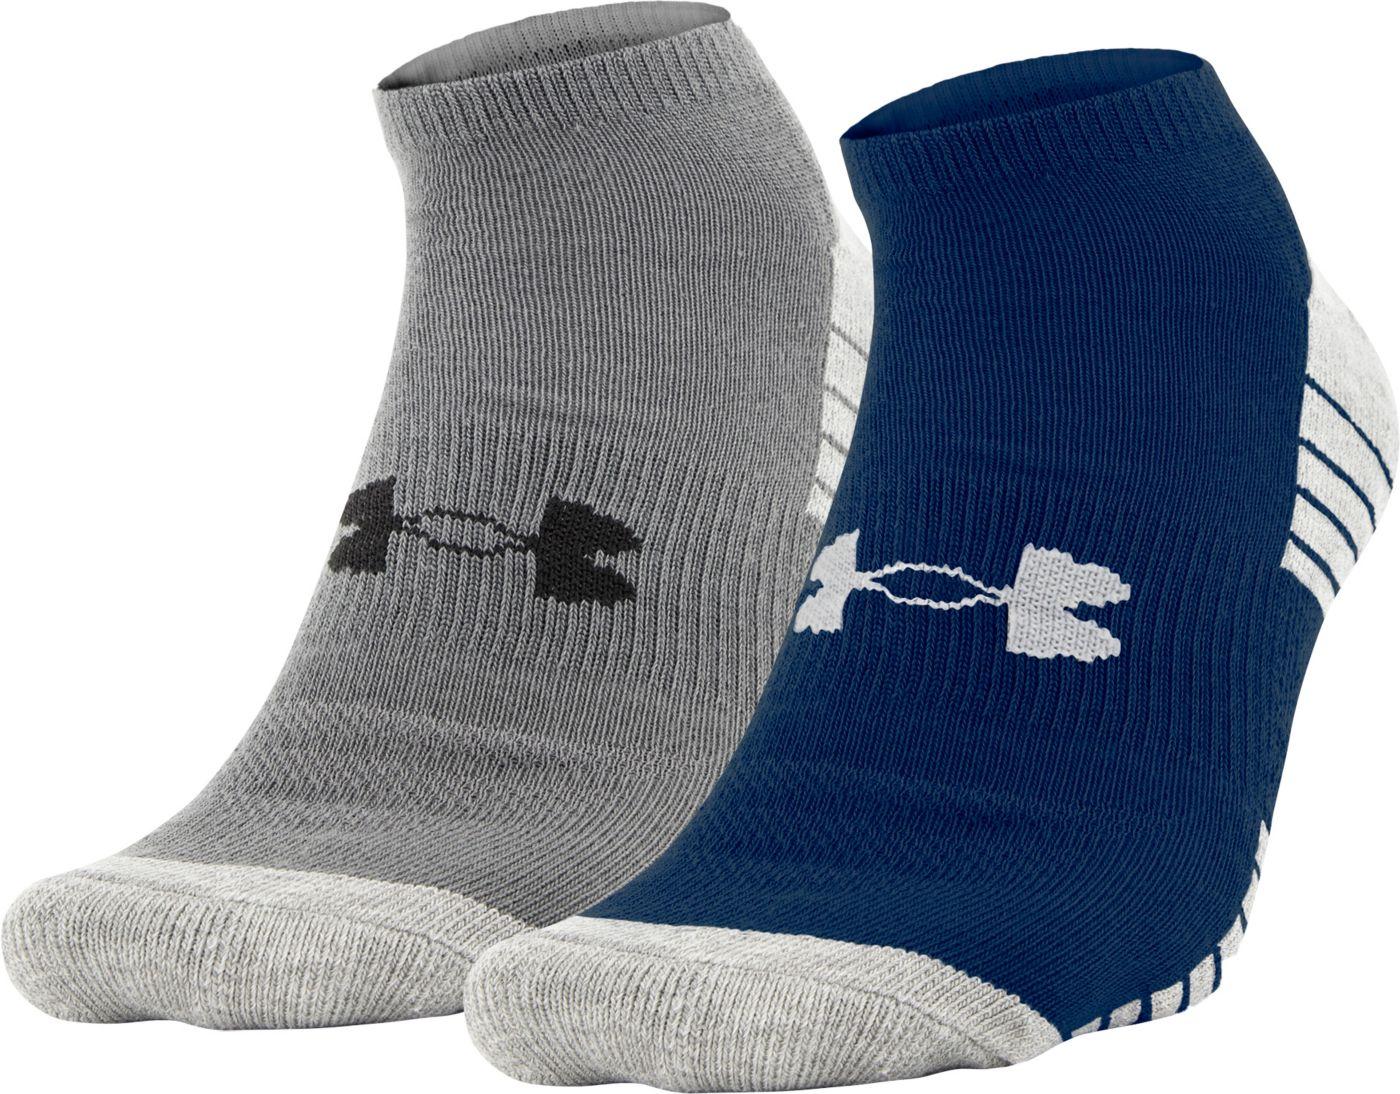 Under Armour Men's Heatgear No Show Socks - 2 Pack